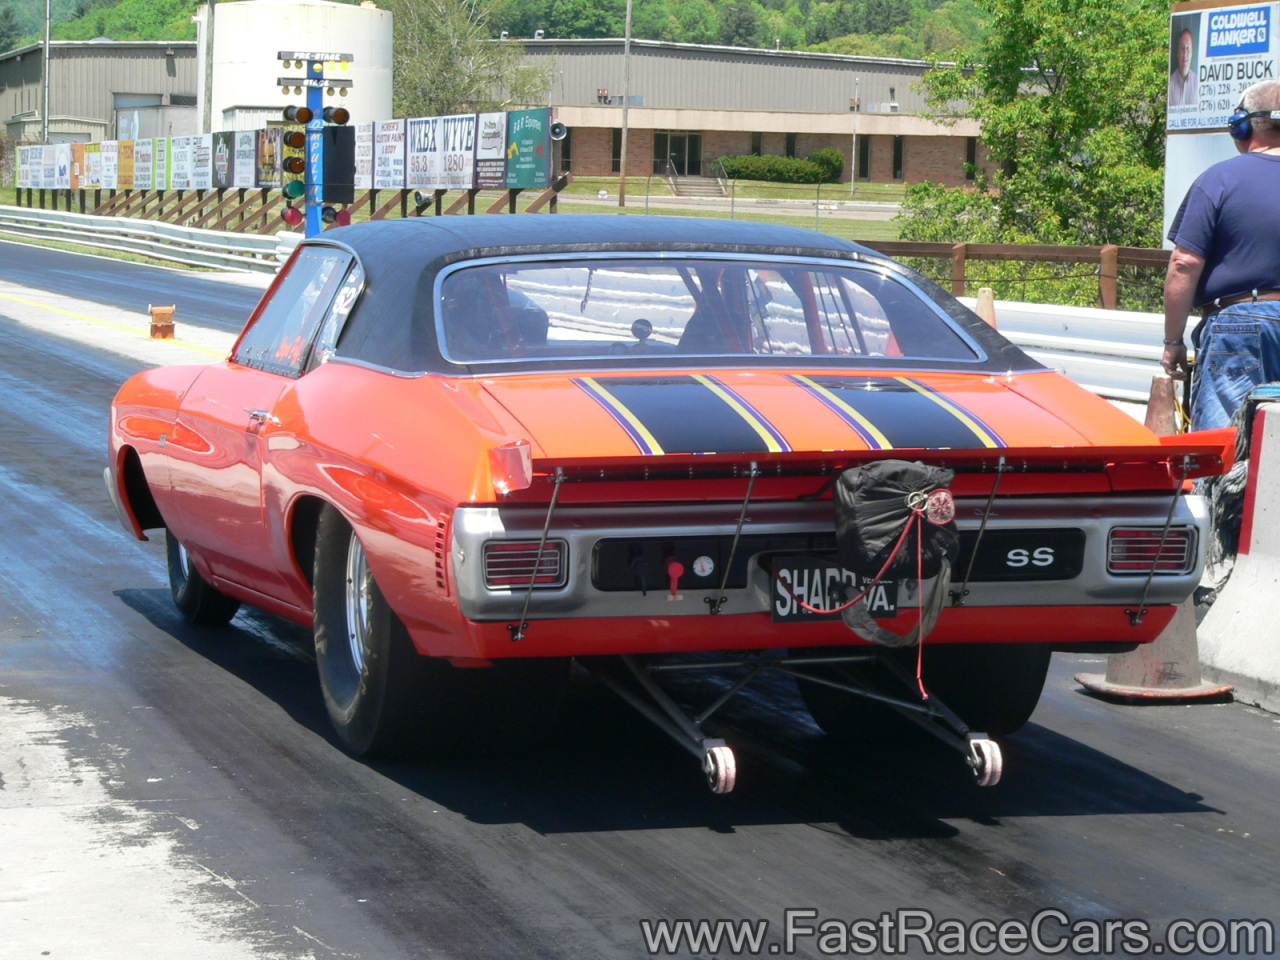 Drag Race Cars > Chevelles > Picture of Orange Chevelle Drag Car ...